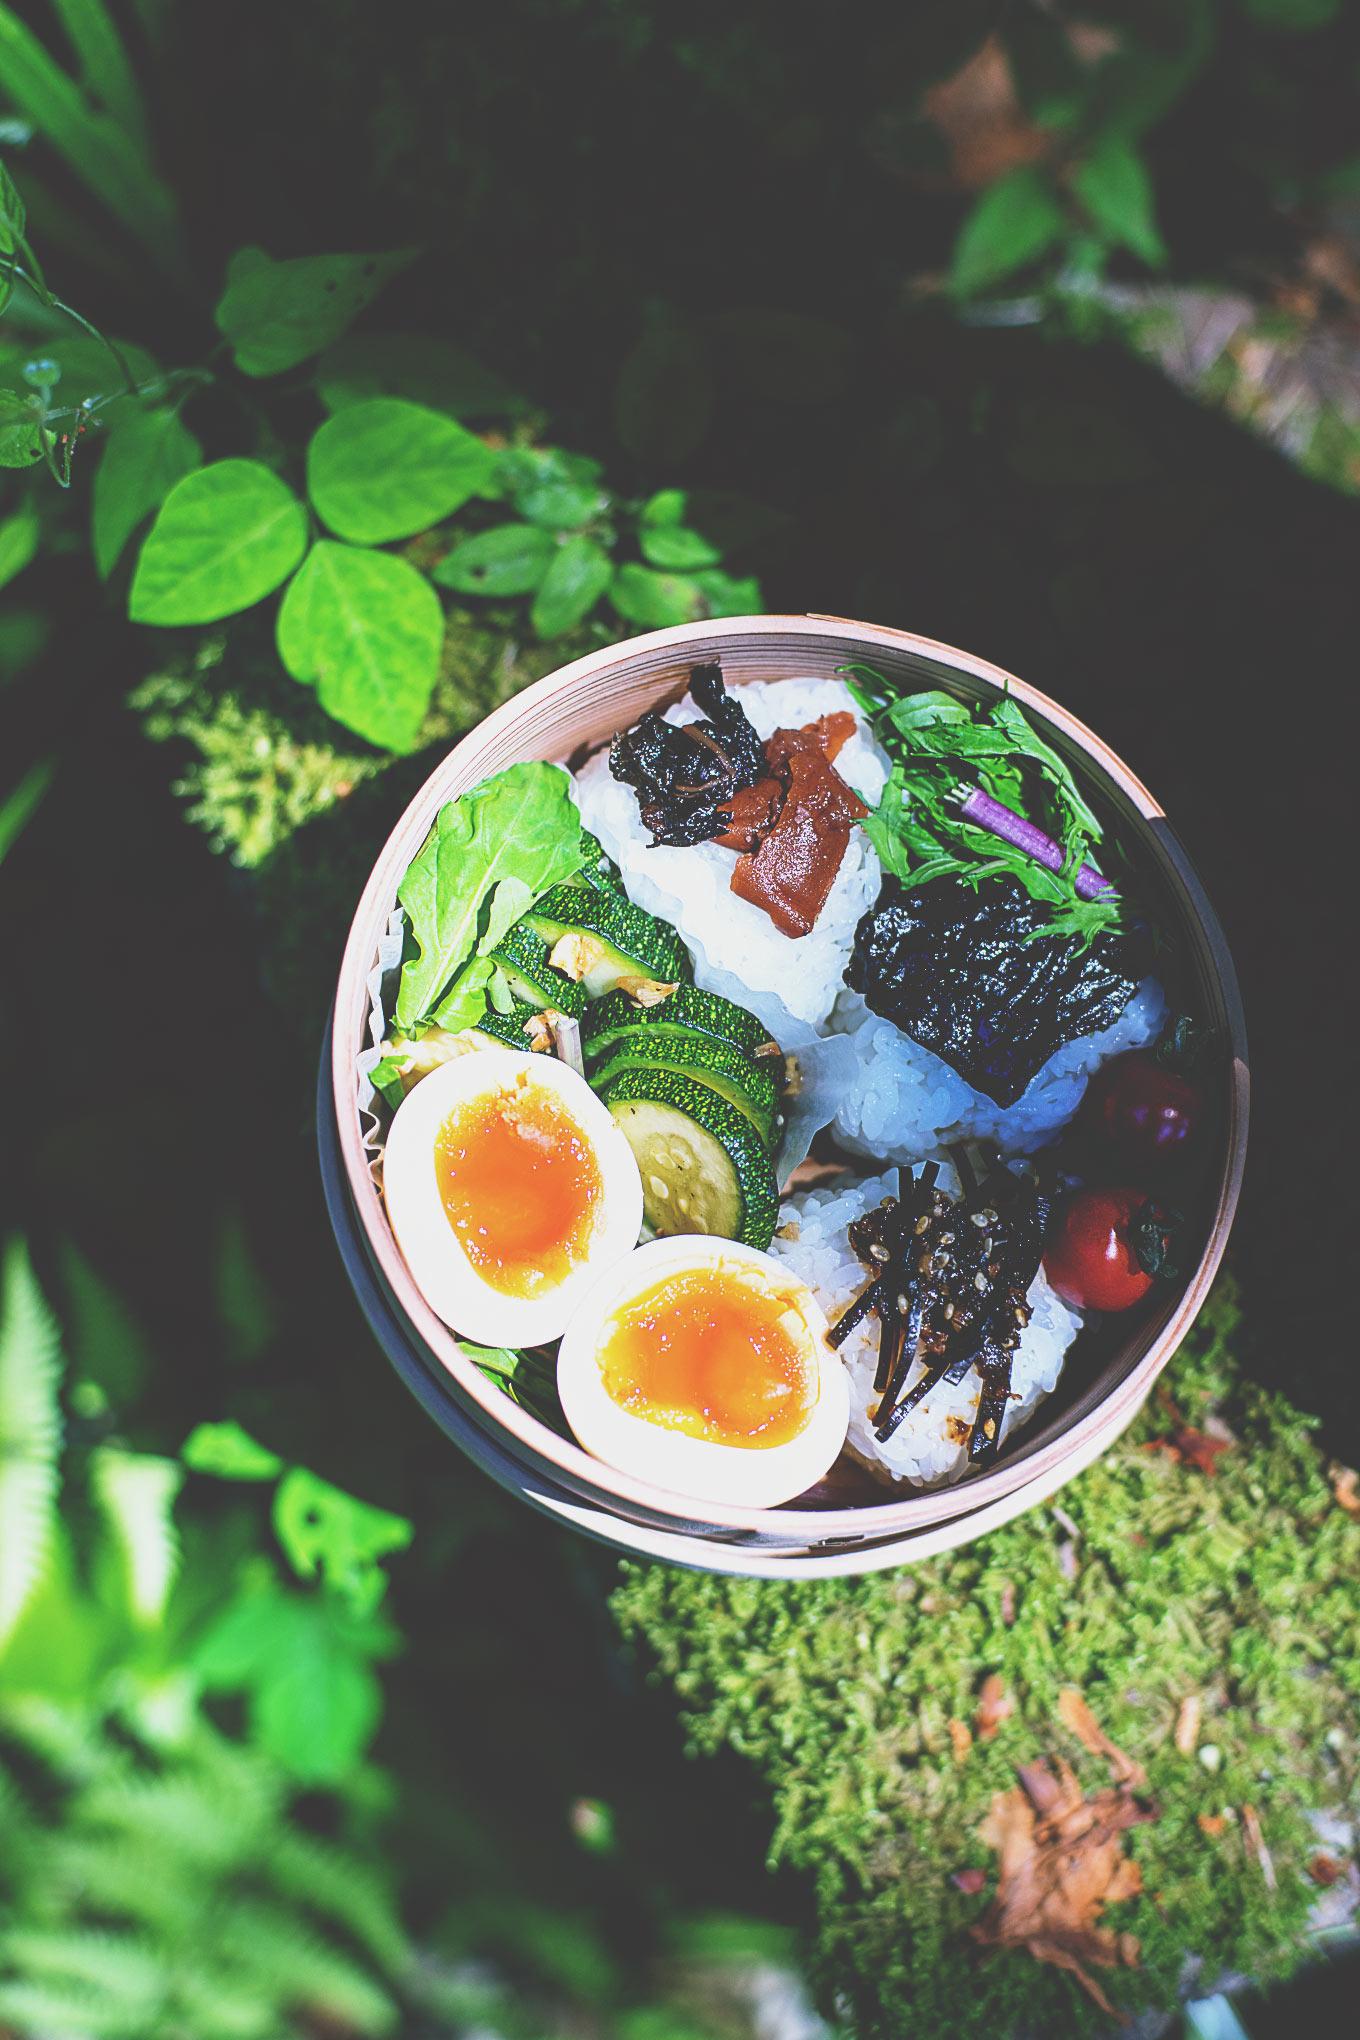 special-onigiri-magewappa-bento-5-2